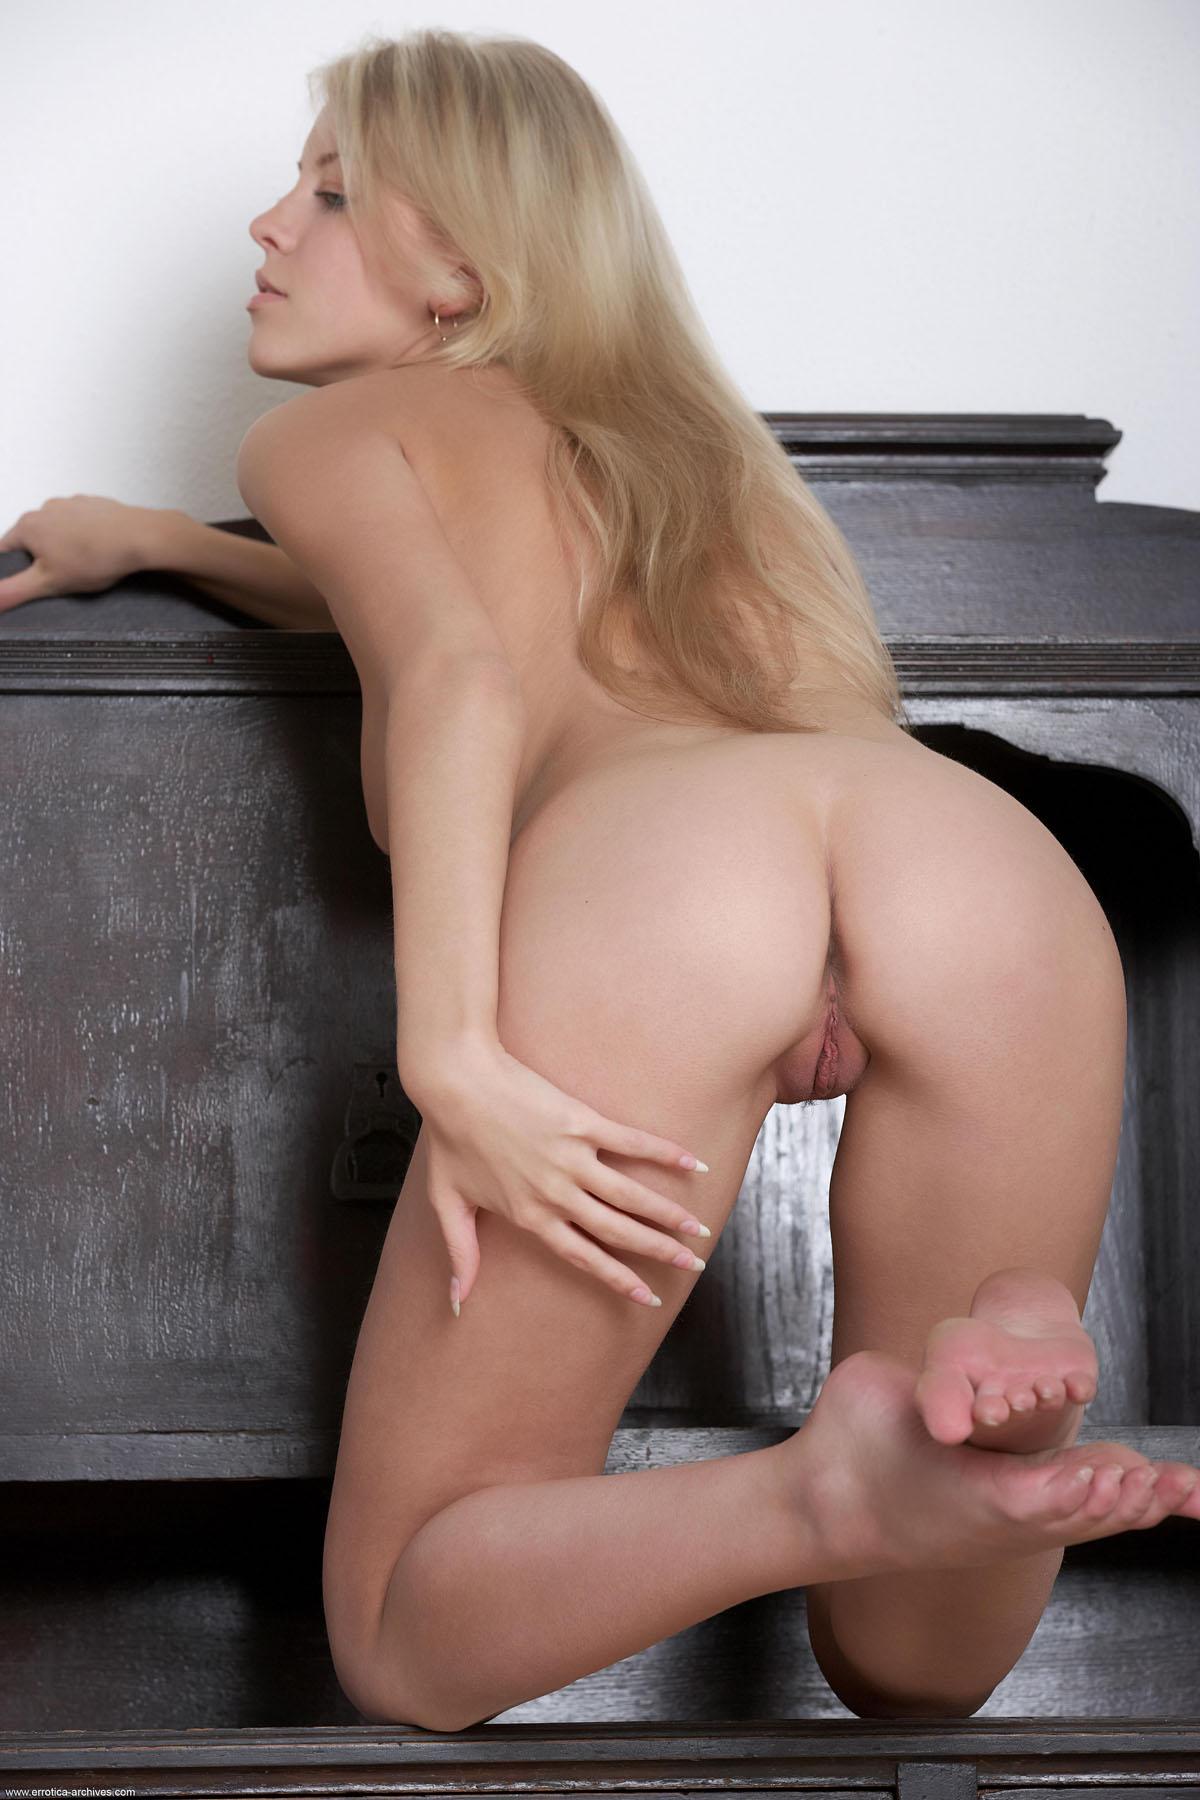 ErroticaArchive_Apalo_Barbara_high_0022.jpg